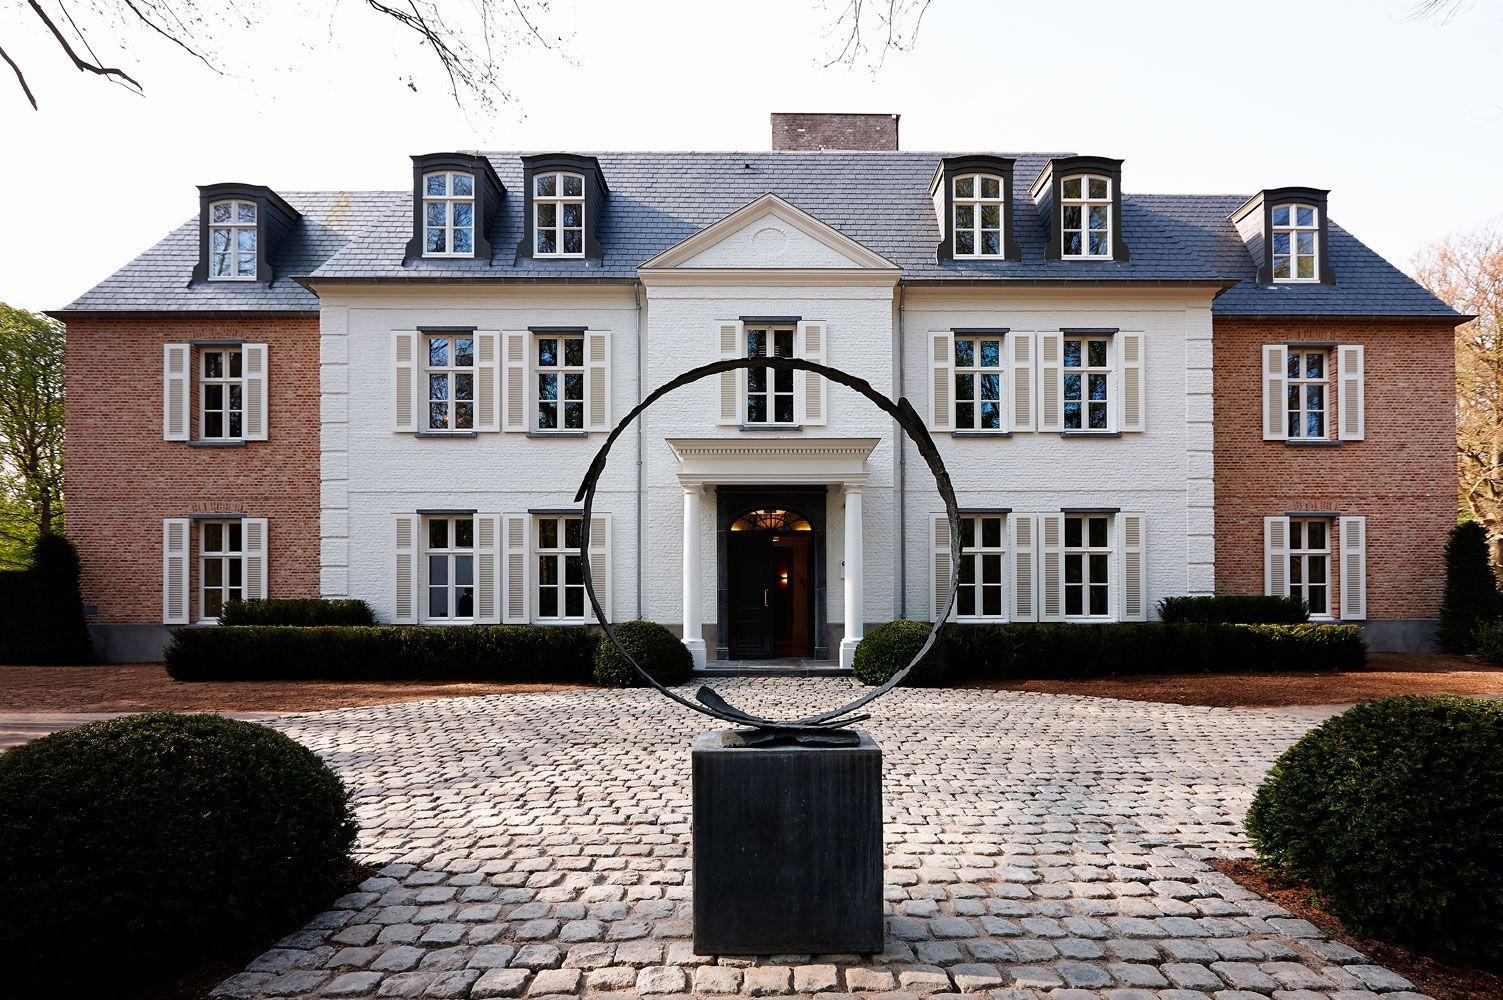 Renovatie Victoriaanse Villa : Construction de villas vlassak verhulst mansions